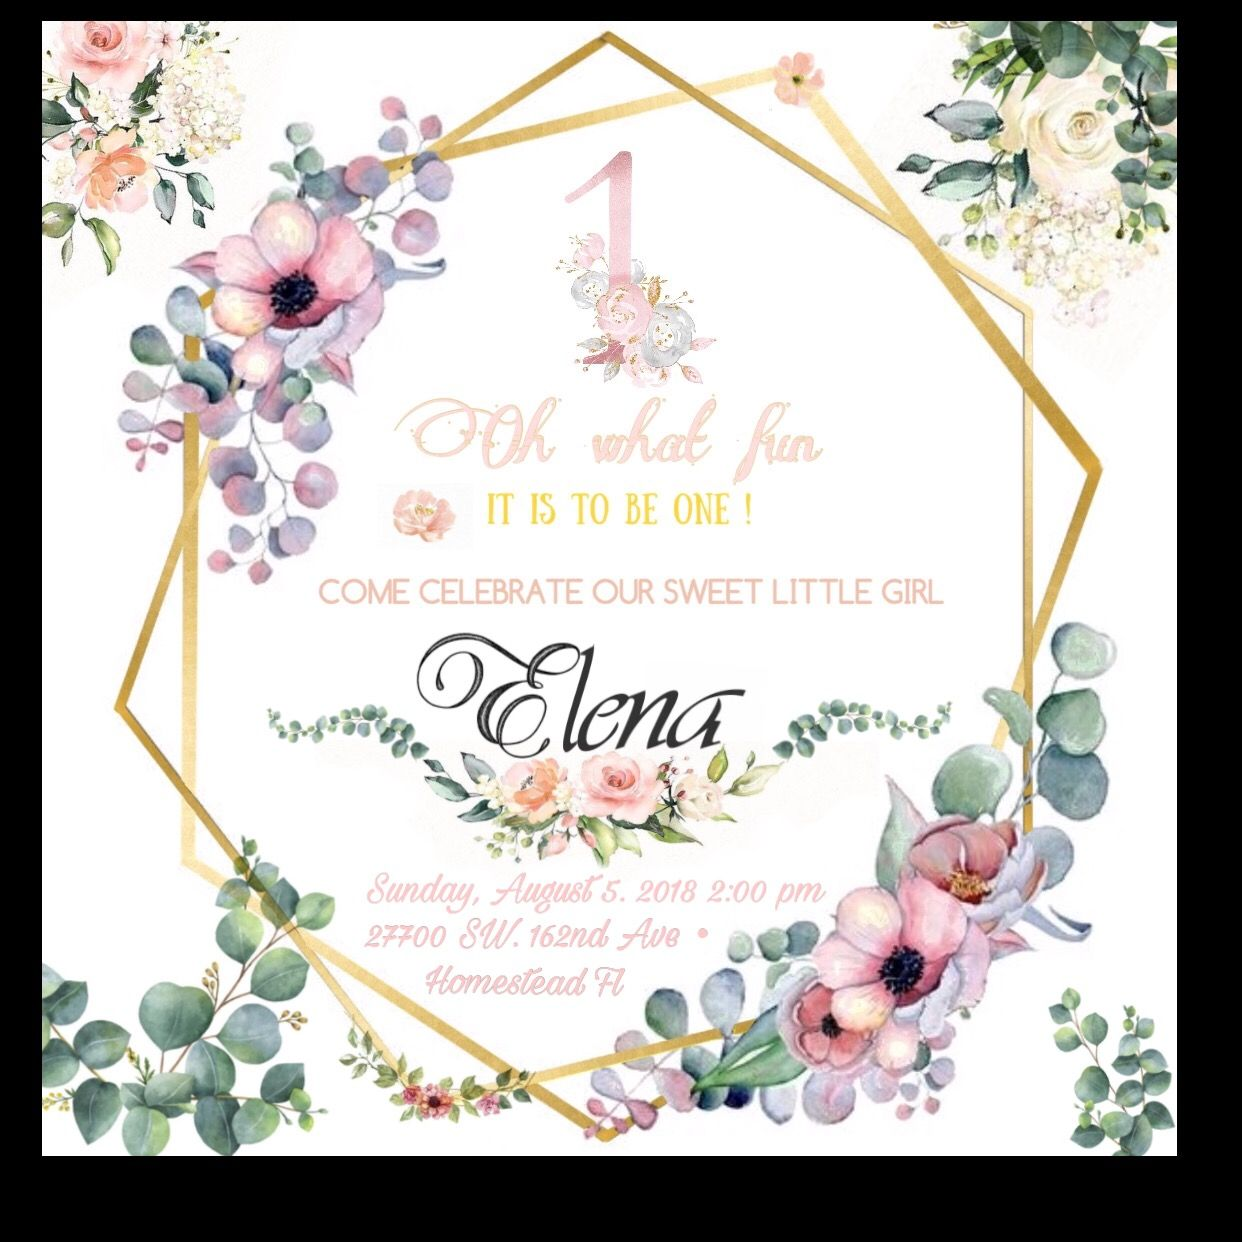 Pin by Elizabeth Gonzalez on Invitation background